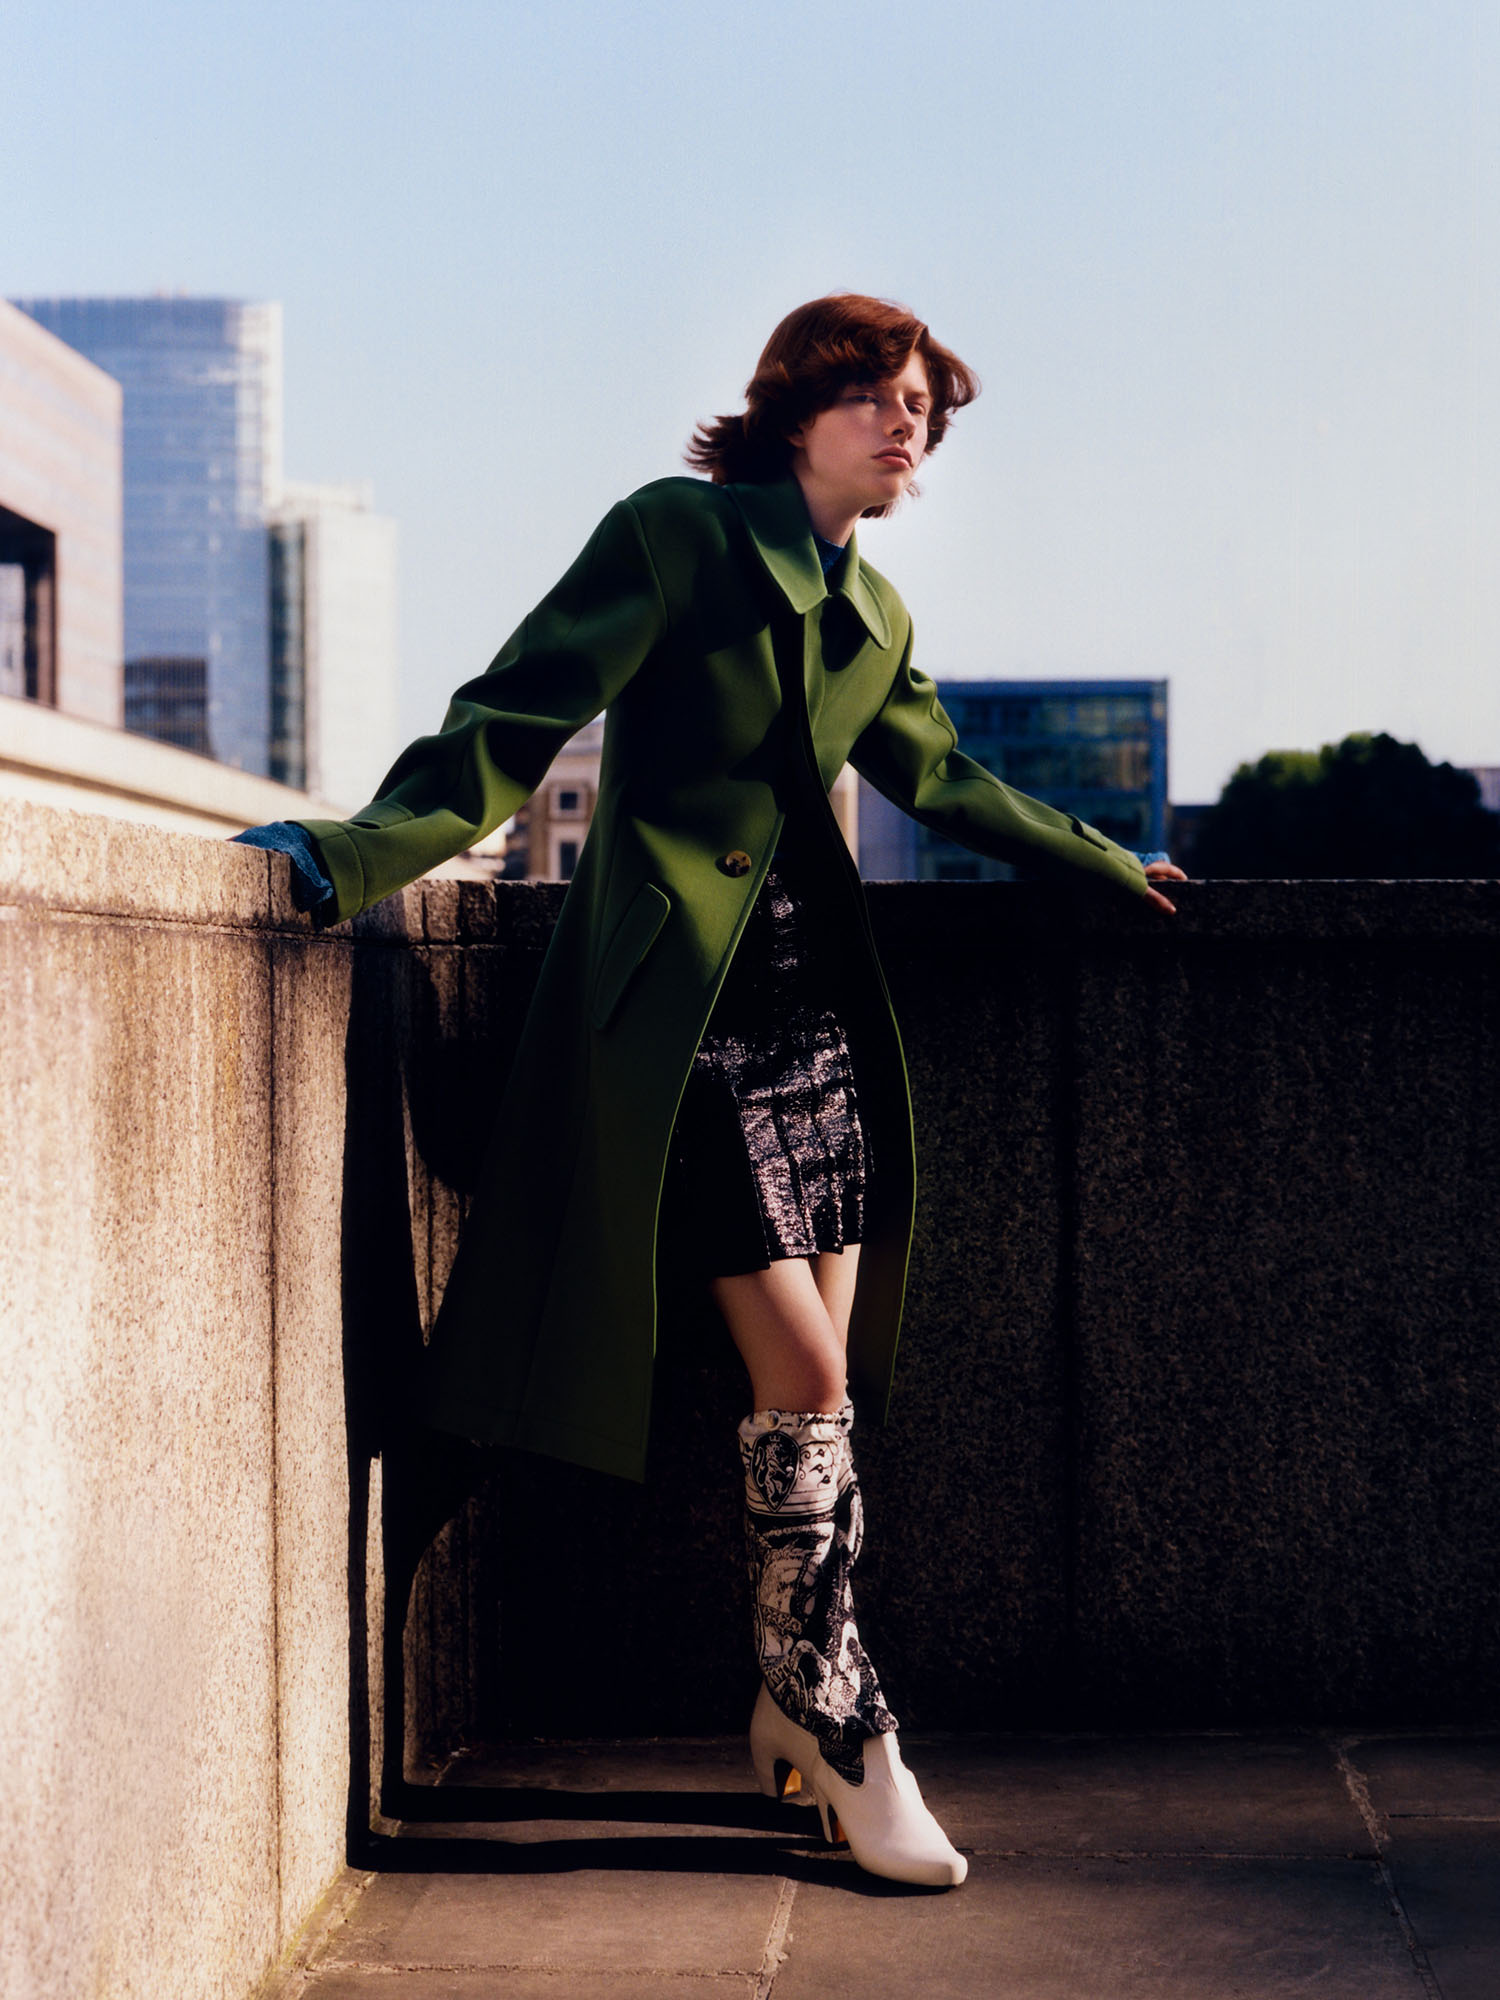 Greg Lin Jiajie Photography Fashion Photographer Jiajie Lin greglin Magazine Campaign Portrait China